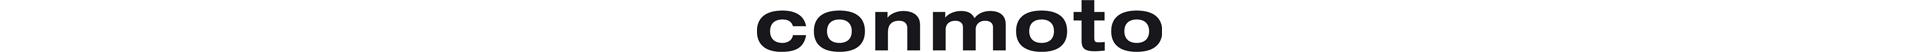 Conmoto_Logo.png